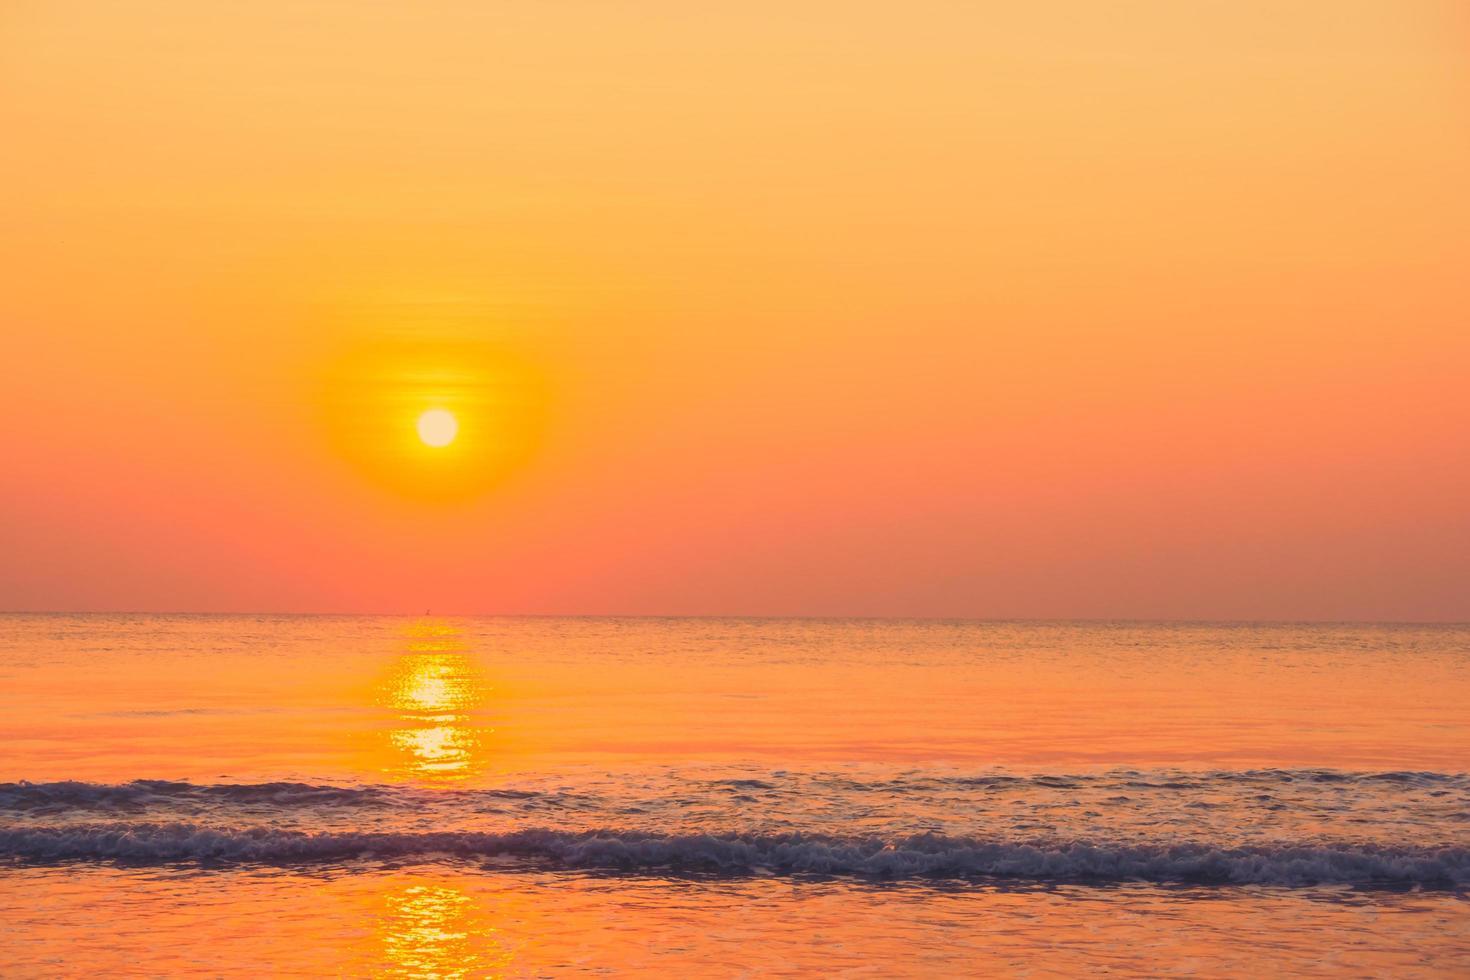 prachtige zonsopgang op het strand foto